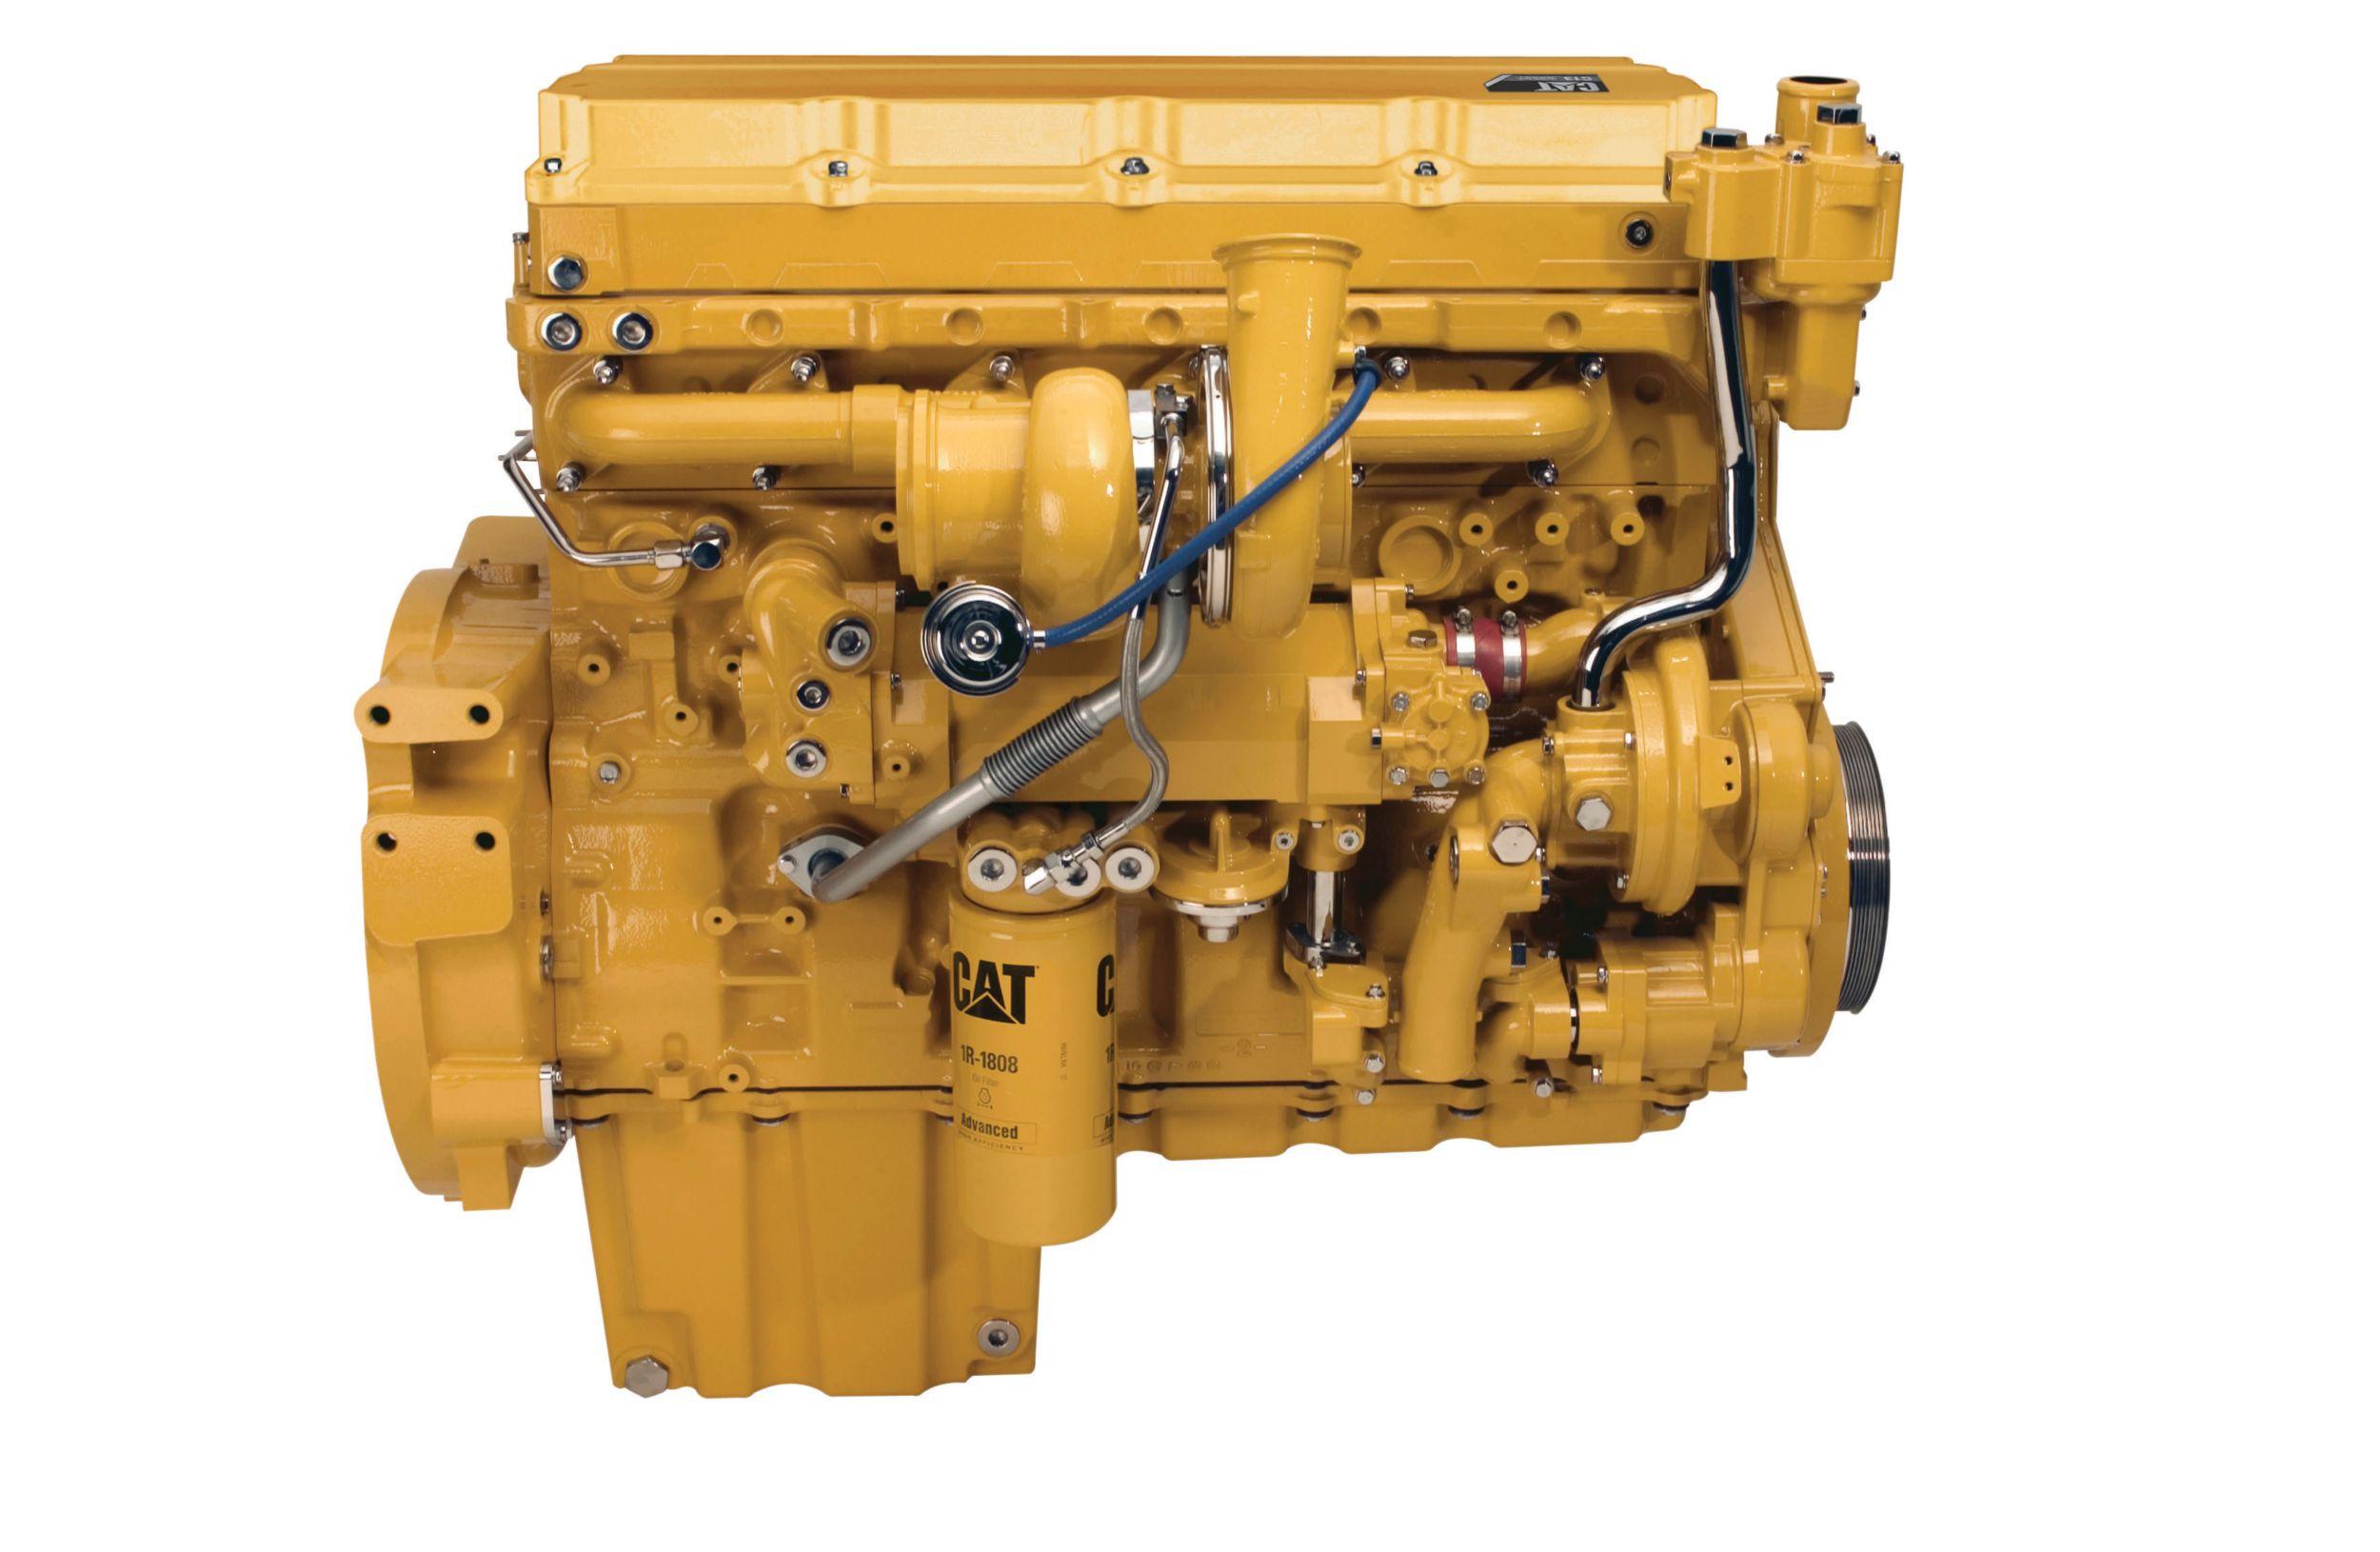 Oil And Gas Cat 3600 Engine Diagram C13 Acert Dry Manifold Petroleum Details